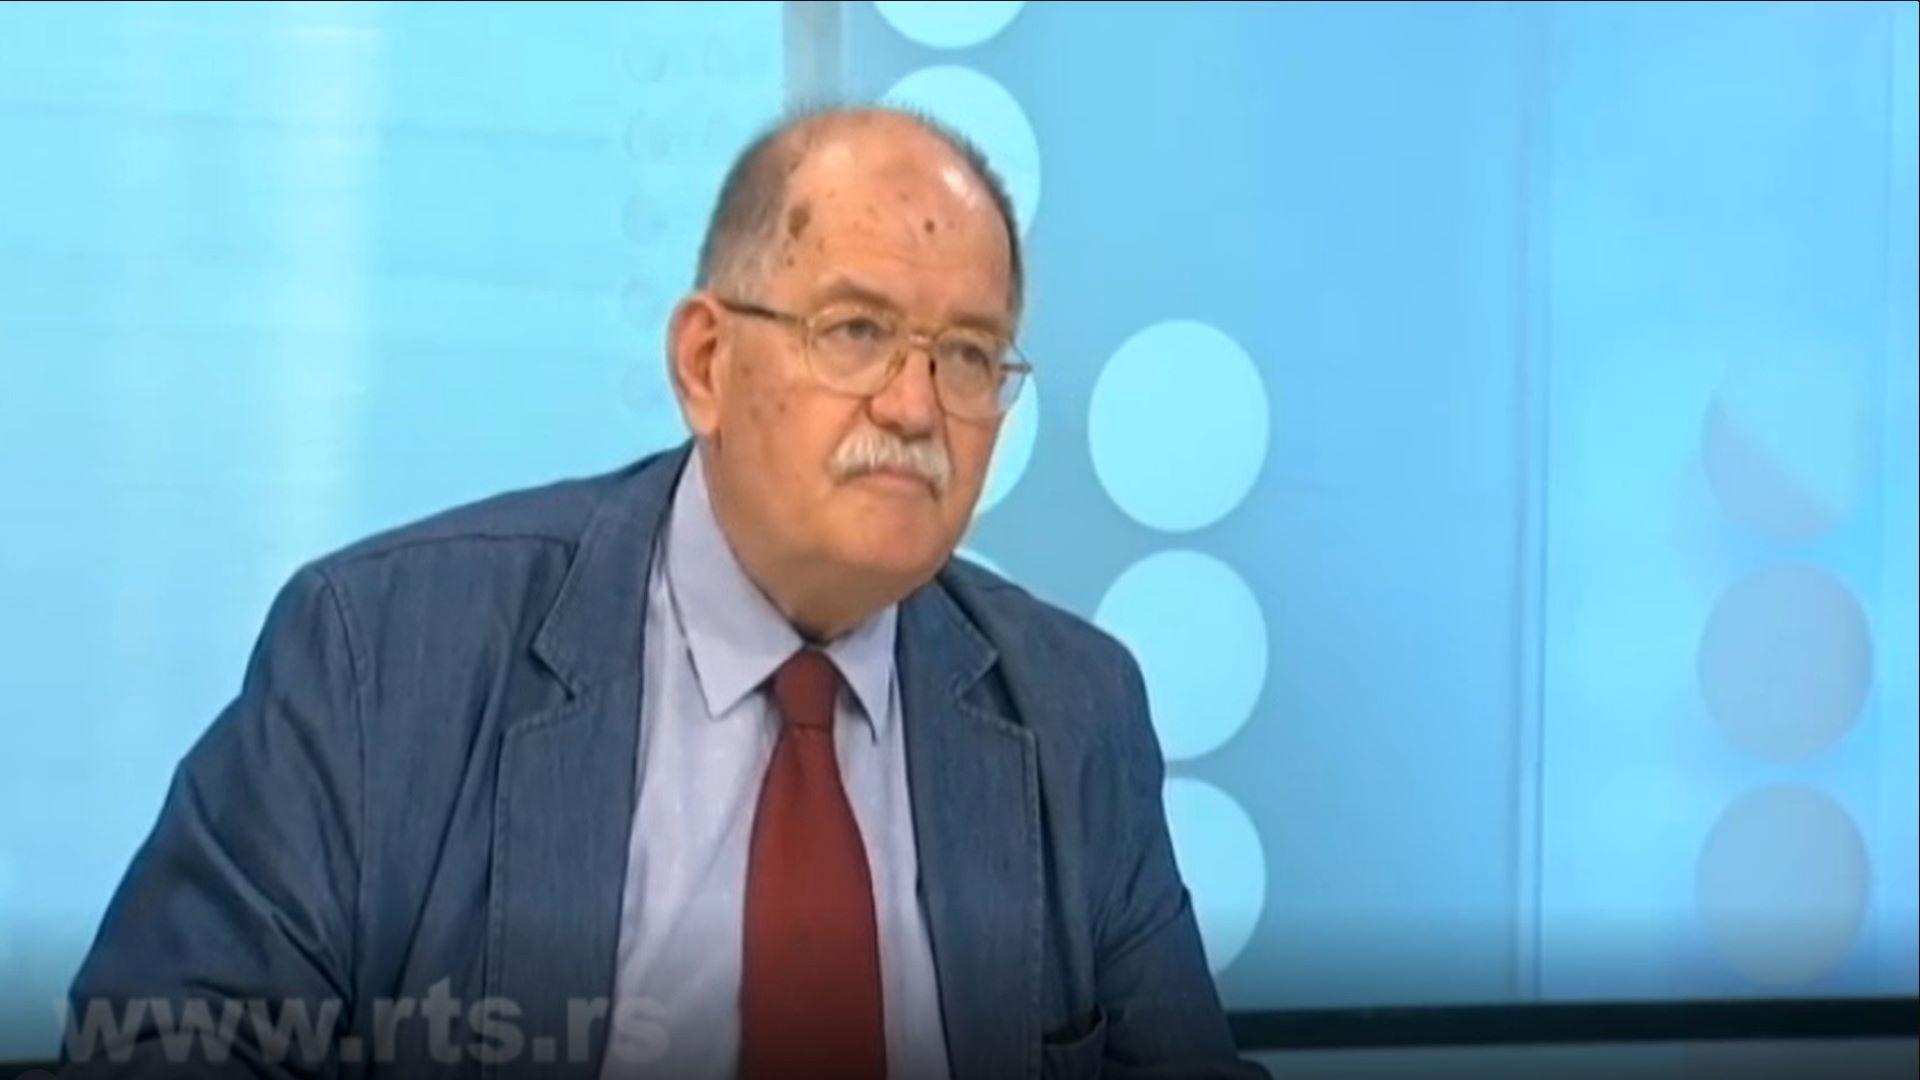 tanaskovic-albanska-propaganda-ne-moze-dovesti-u-pitanje-pravoslavni-karakter-svetinja-na-kim